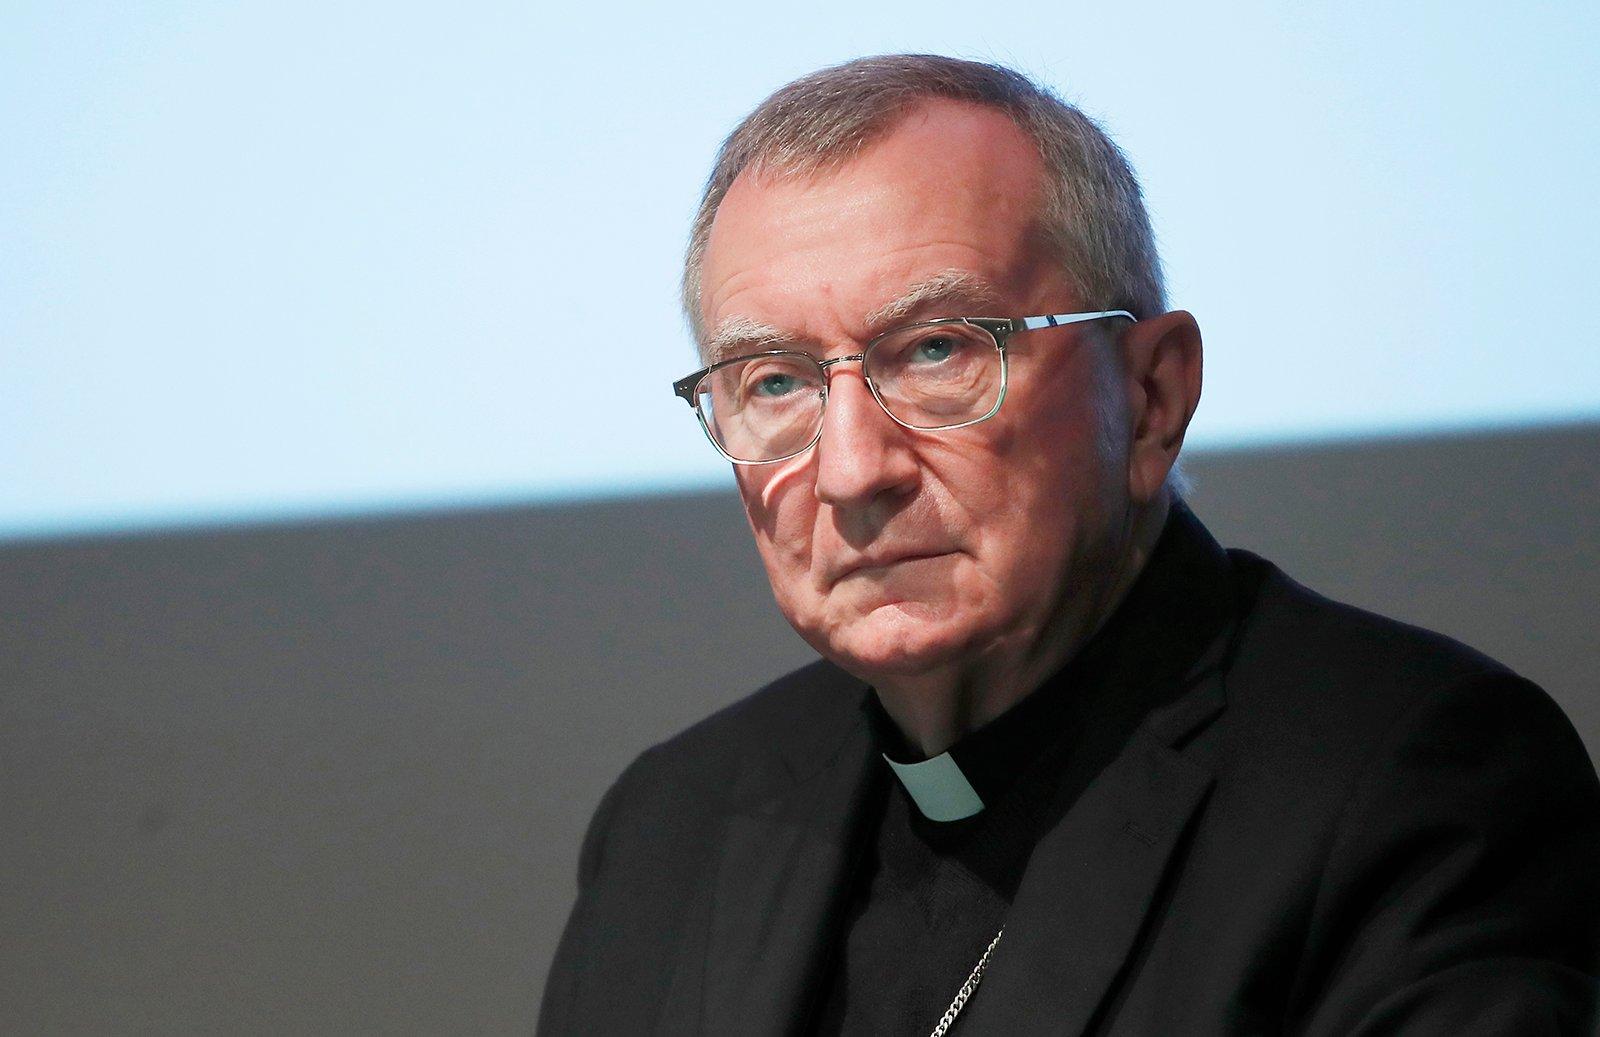 Vatican Secretary of State Cardinal Pietro Parolin attends a meeting in Milan, Italy, Saturday, Oct. 3, 2020. (AP Photo/Antonio Calanni)